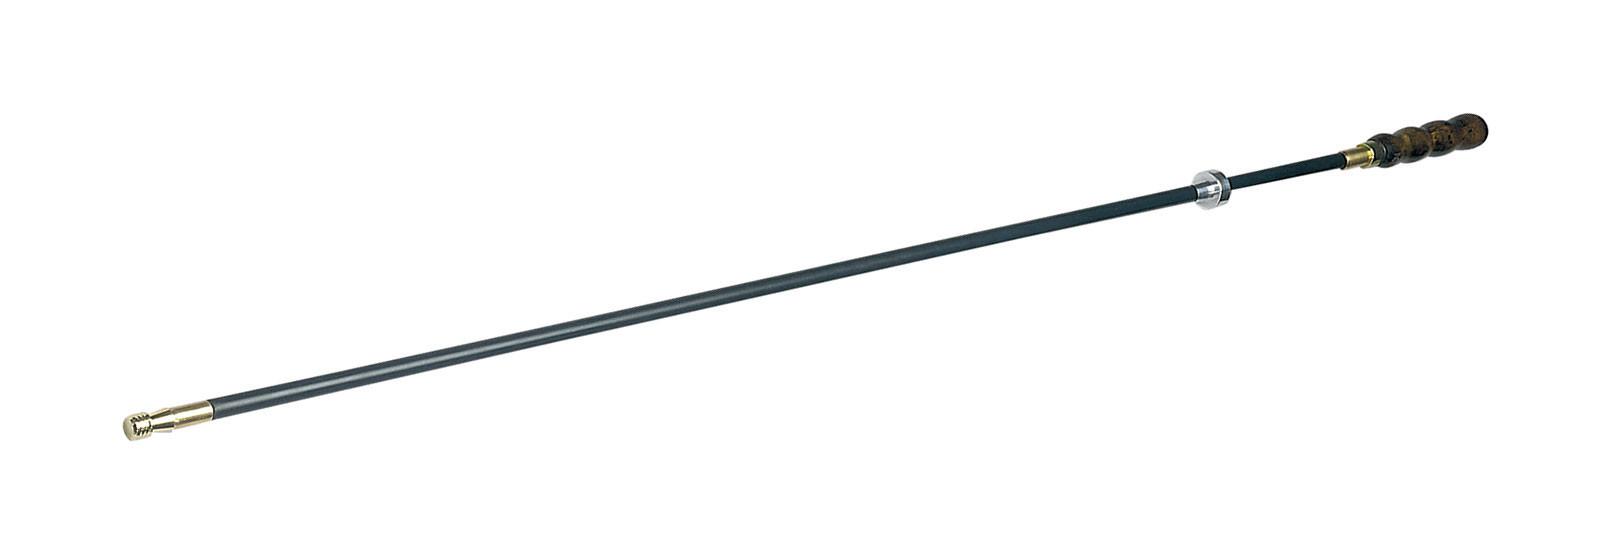 Fiberglass rod .75 cal.